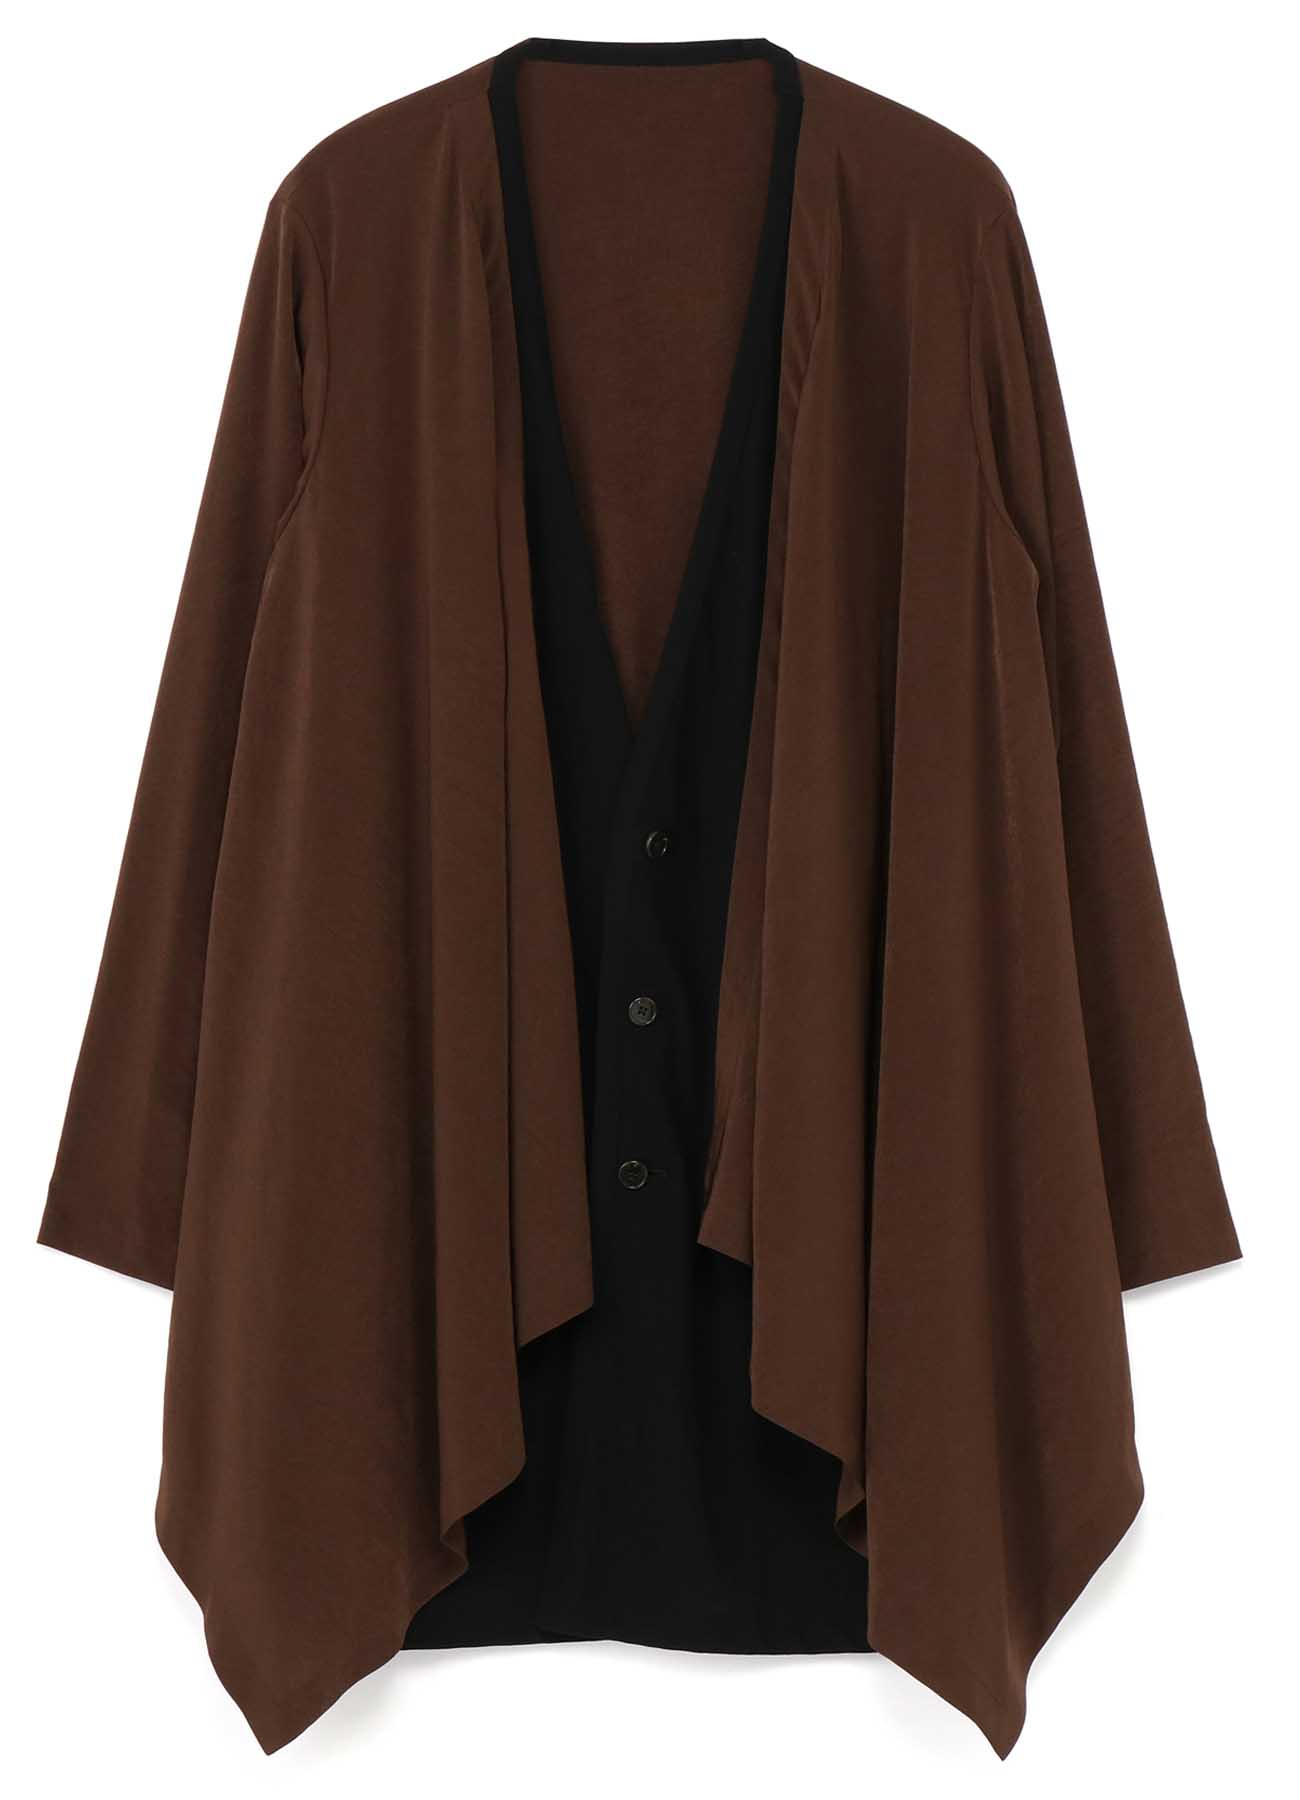 T/A Vintage Decyne Combination Layered Drape Cardigan